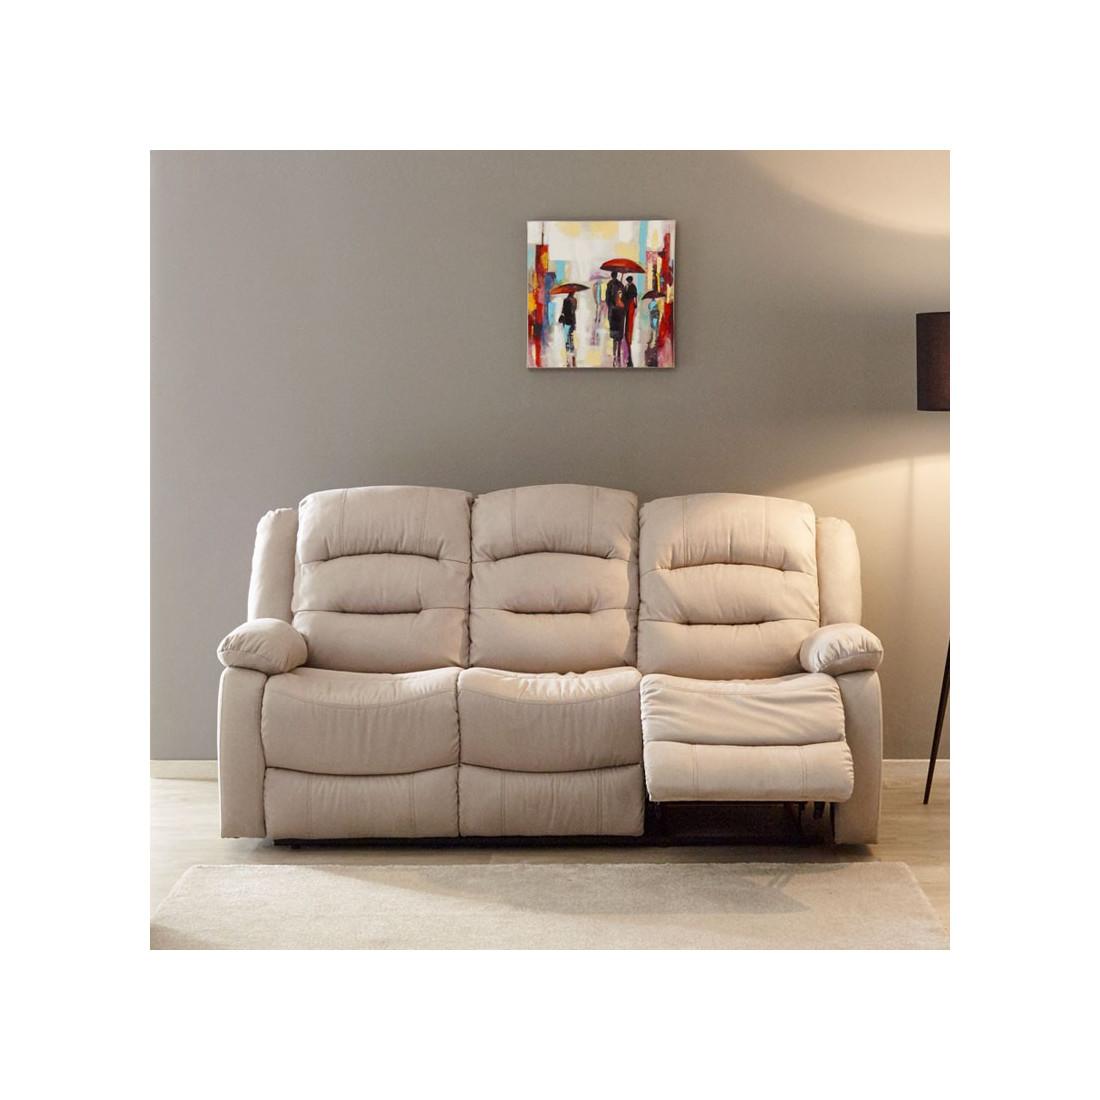 Salon complet 5 relax manuels tissu nerval univers du salon - Salon complet ...